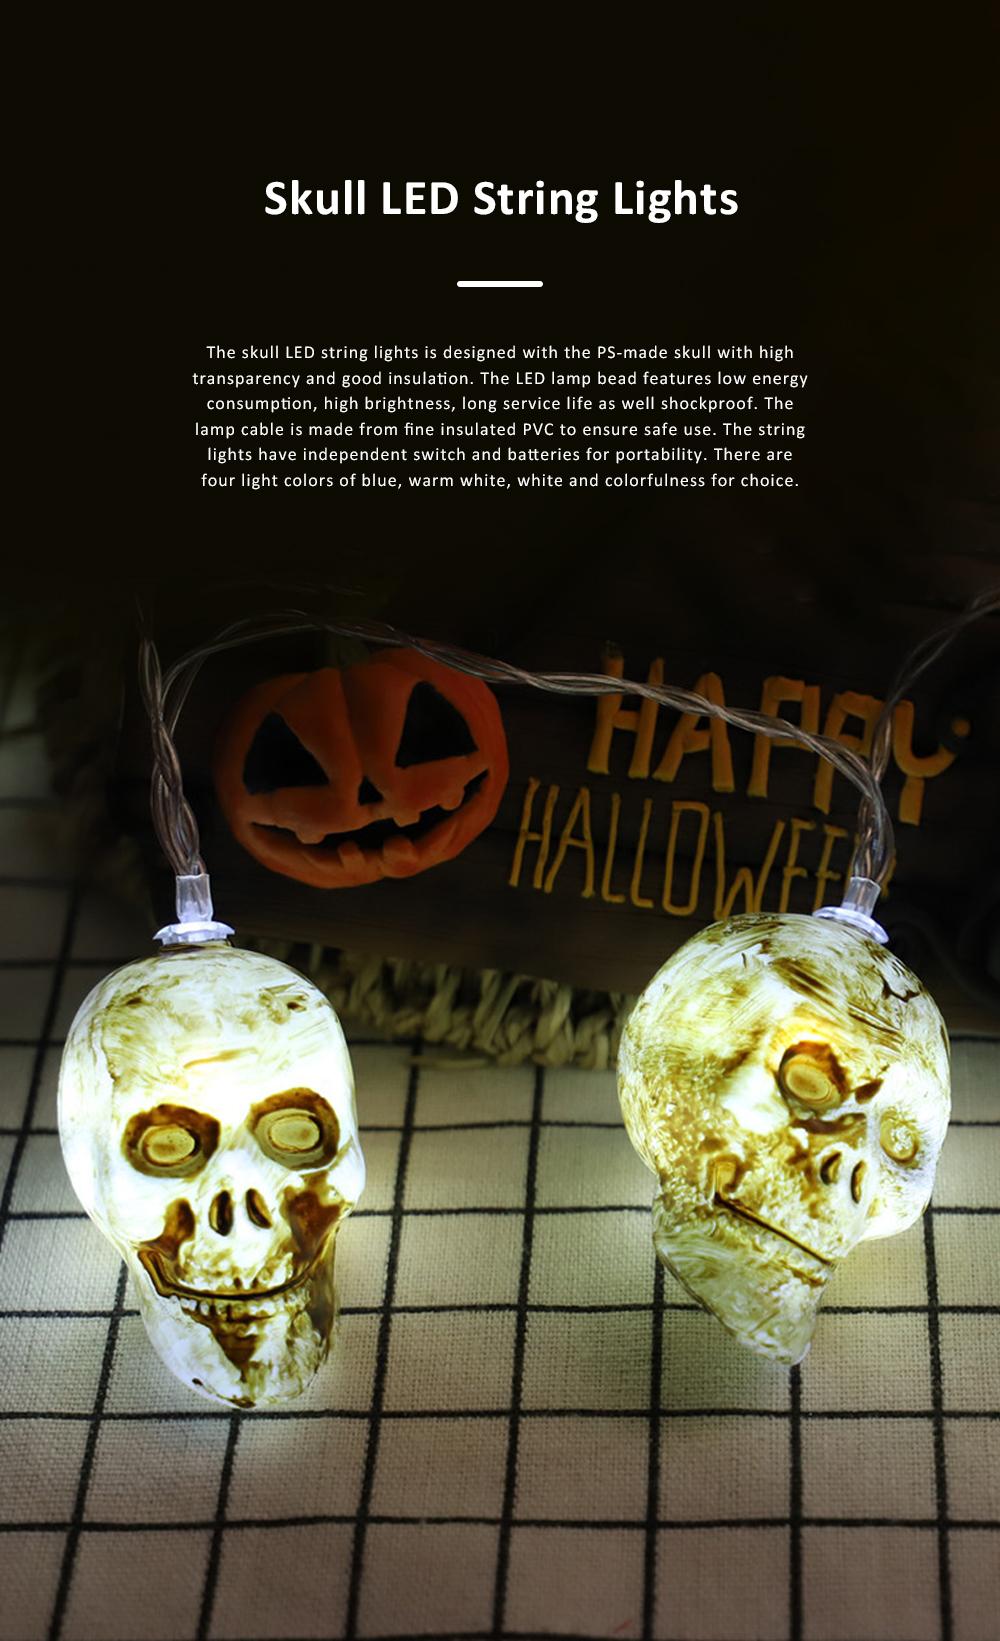 Skelton LED String Lights for Hallows' Day Decoration New Style Skull Spirit Festival Decorative Lighting Chains 0